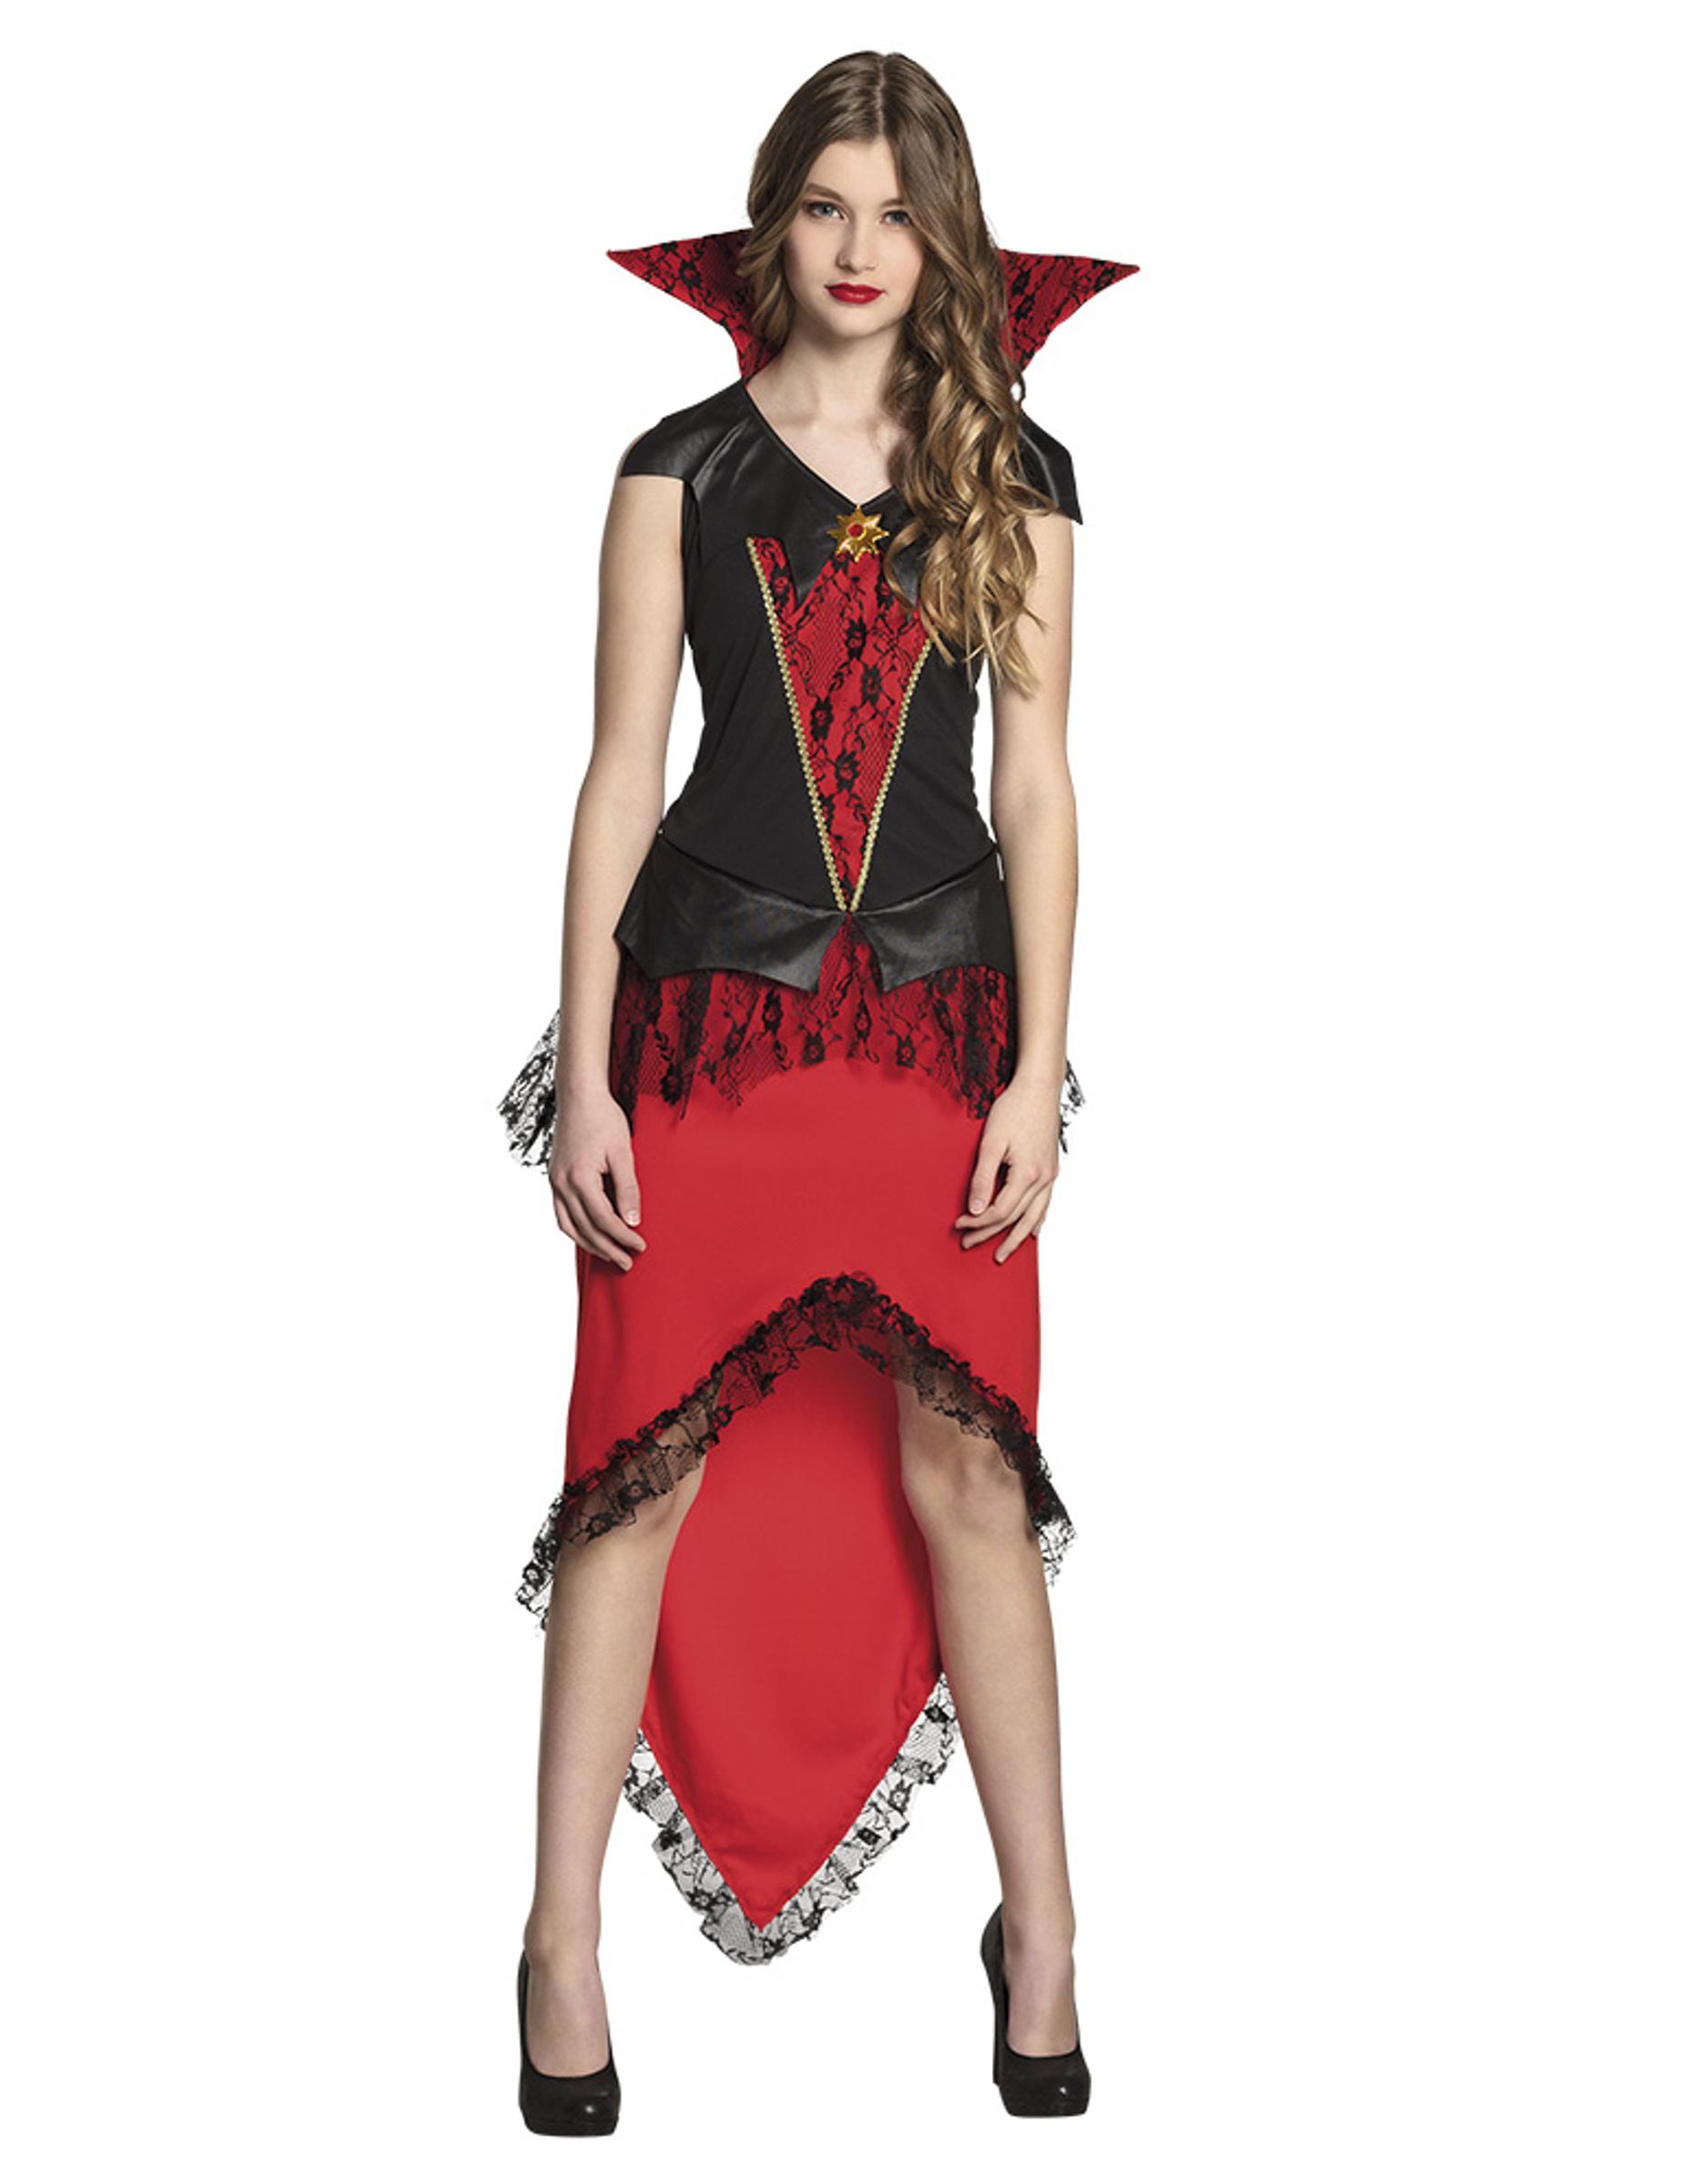 teenager vampir verkleidung halloween kost m schwarz rot. Black Bedroom Furniture Sets. Home Design Ideas